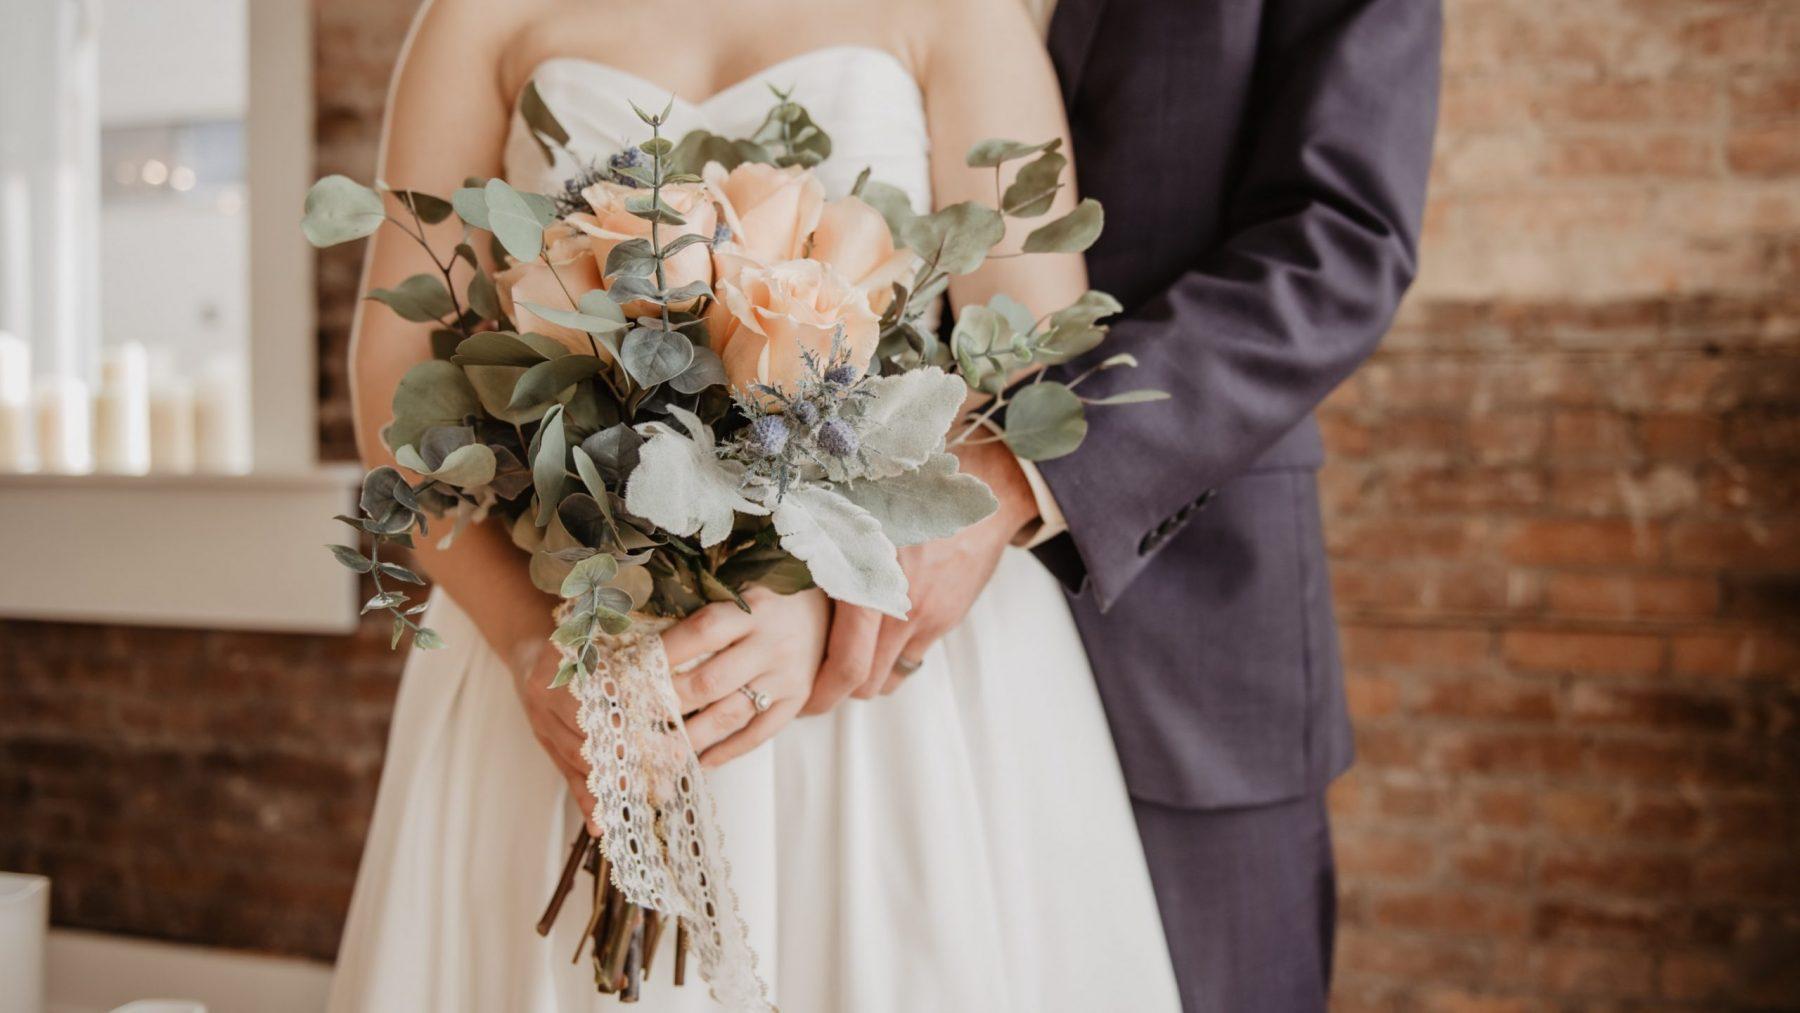 married at first sight australia mafs